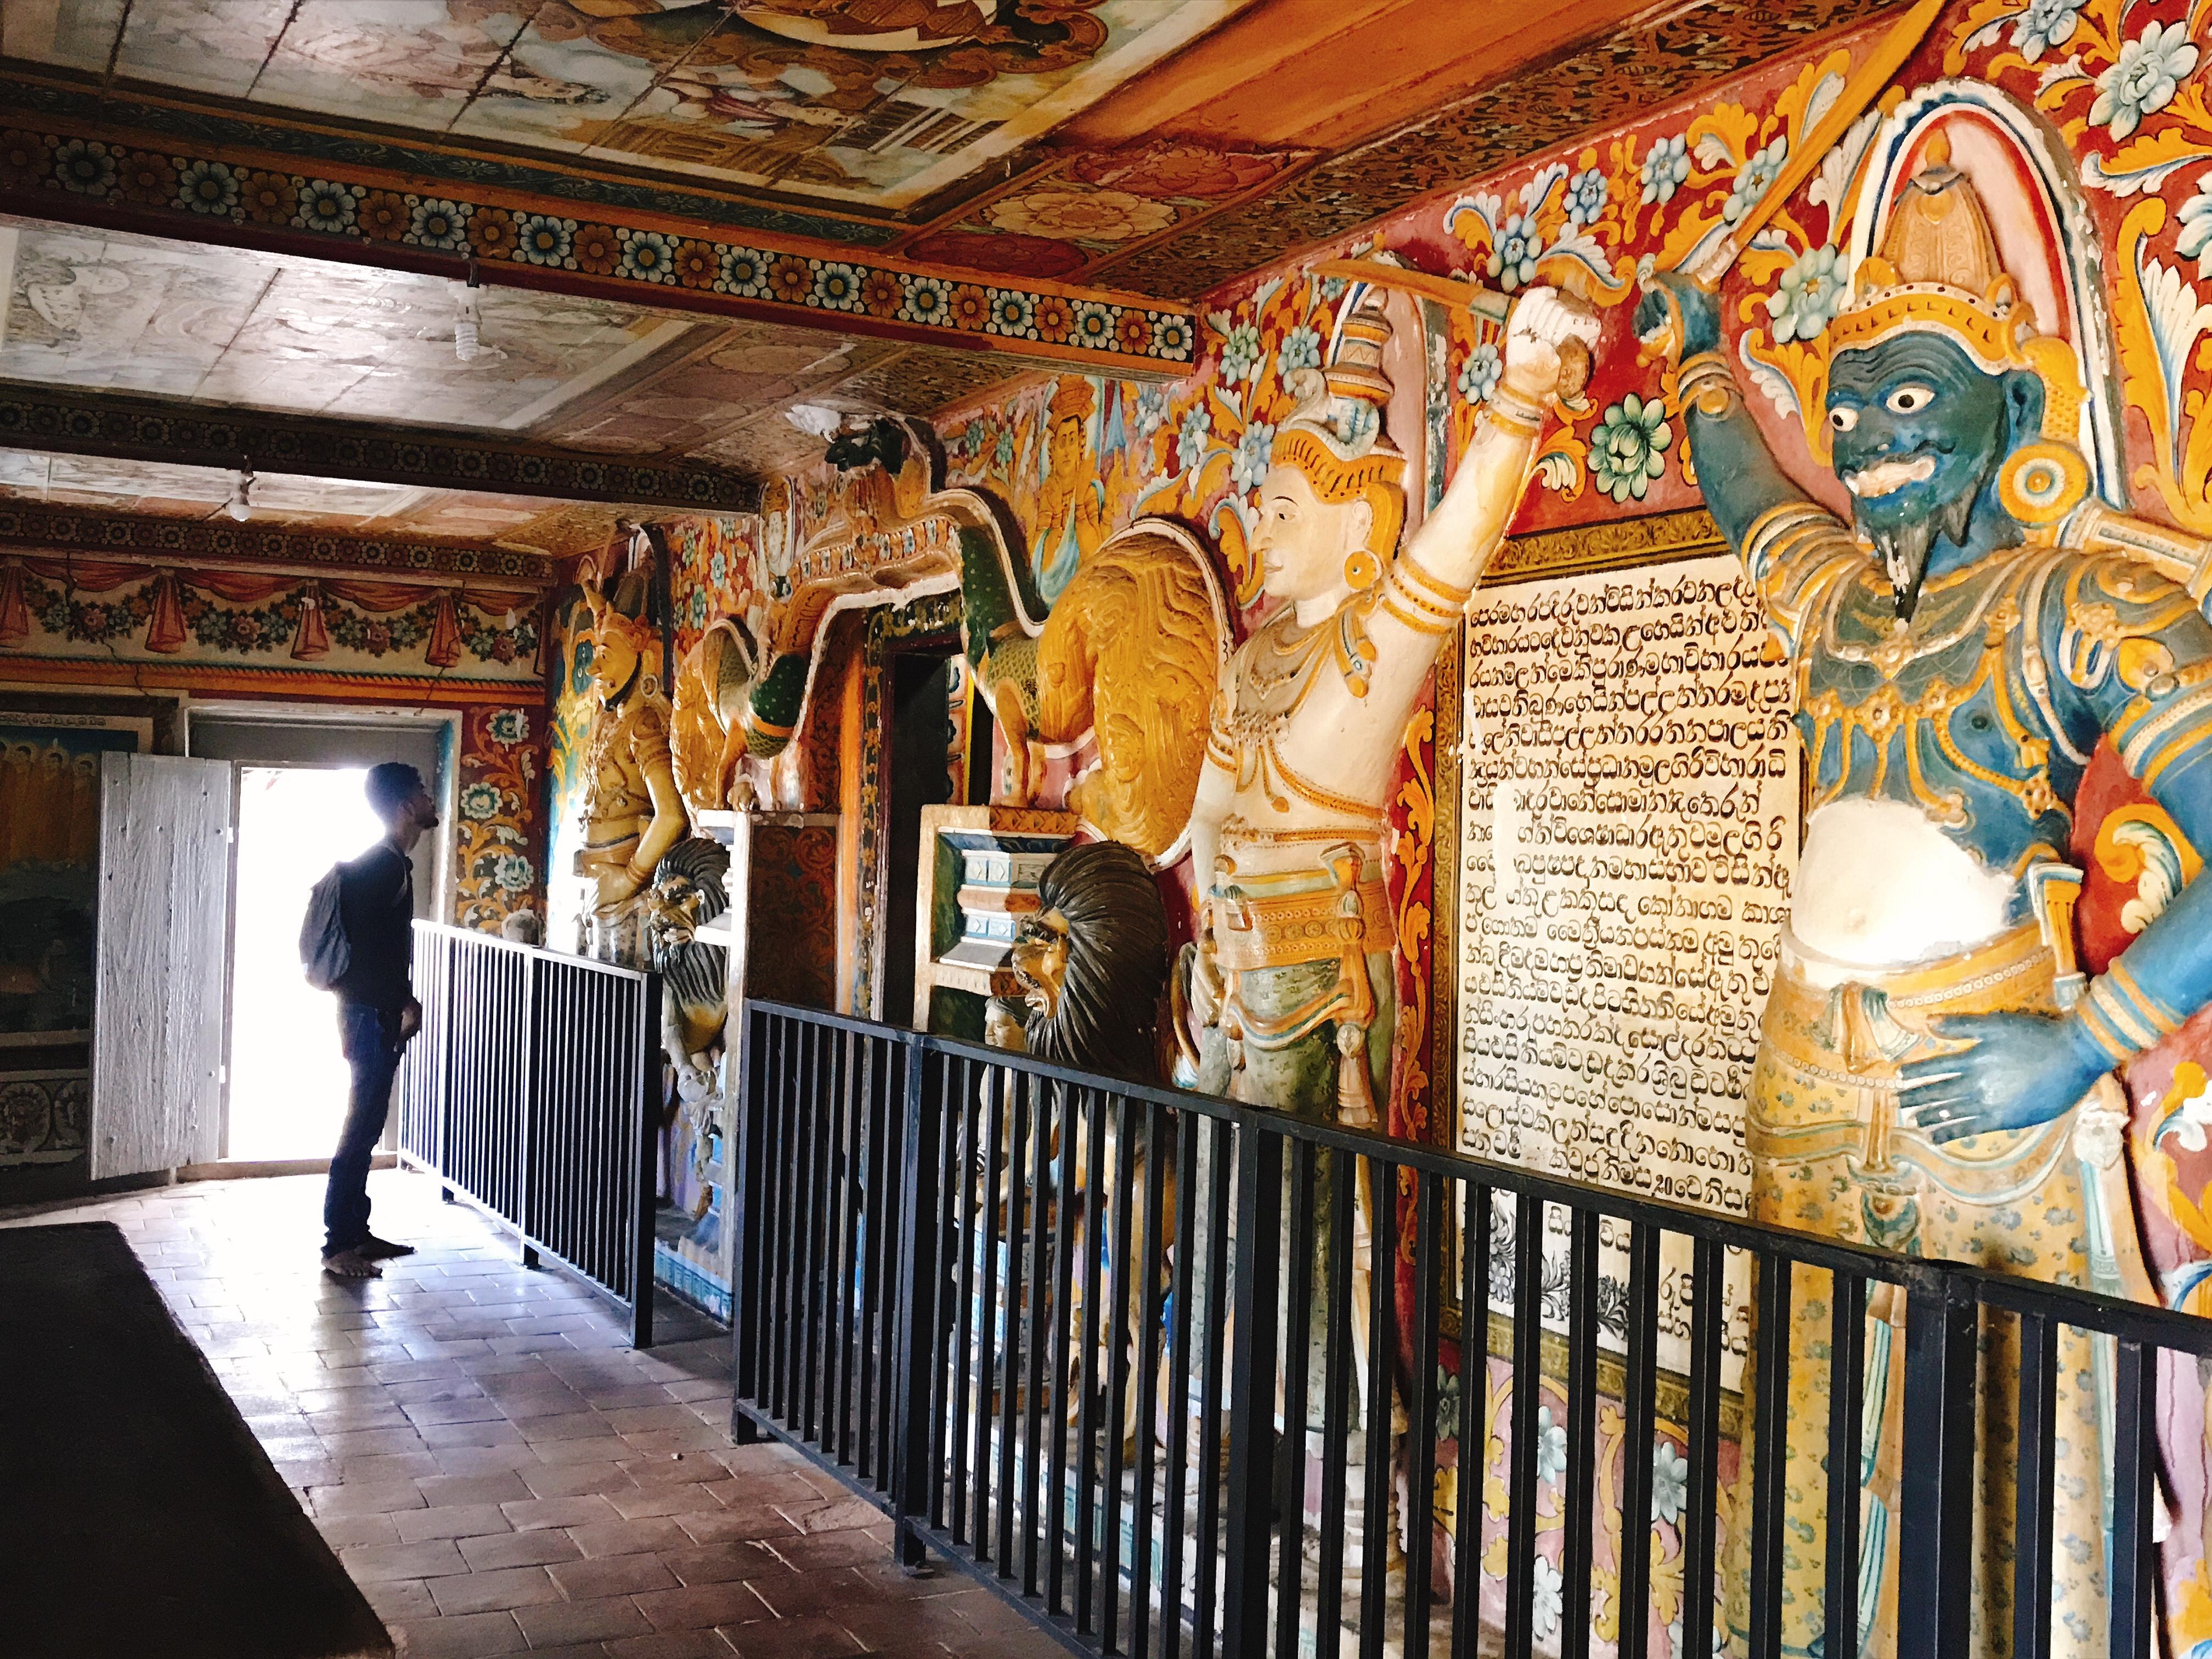 Sri Lanka Jasmine Tours & Drivers スリランカジャスミンツアーズ撮影。 マルキリガラ寺院 マルキリガラ遺跡 ムルキリガラ の洞窟 石窟入口